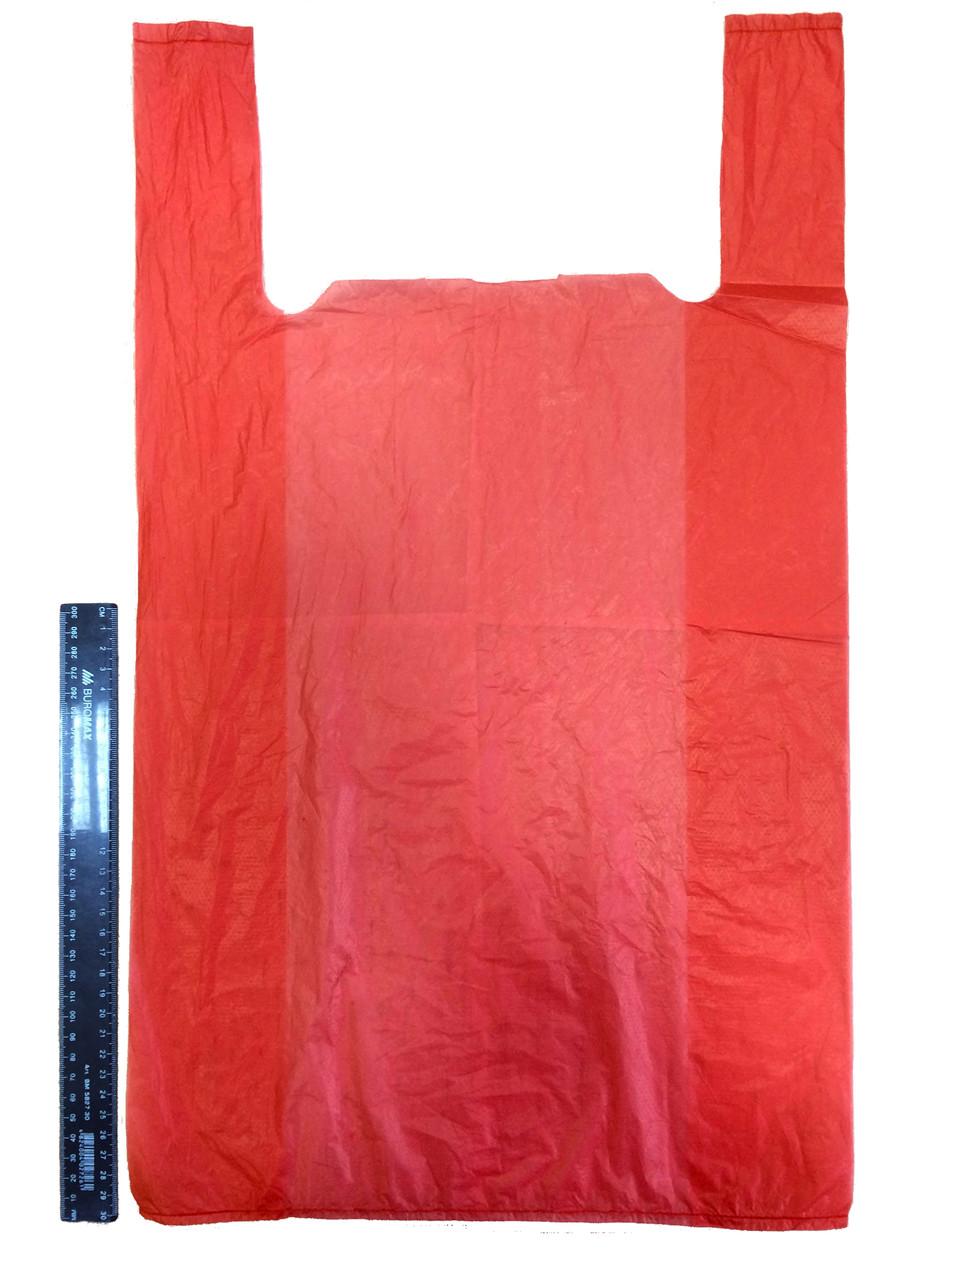 Пакет поліетиленовий-майка №5 35*60 см, 1000 шт.